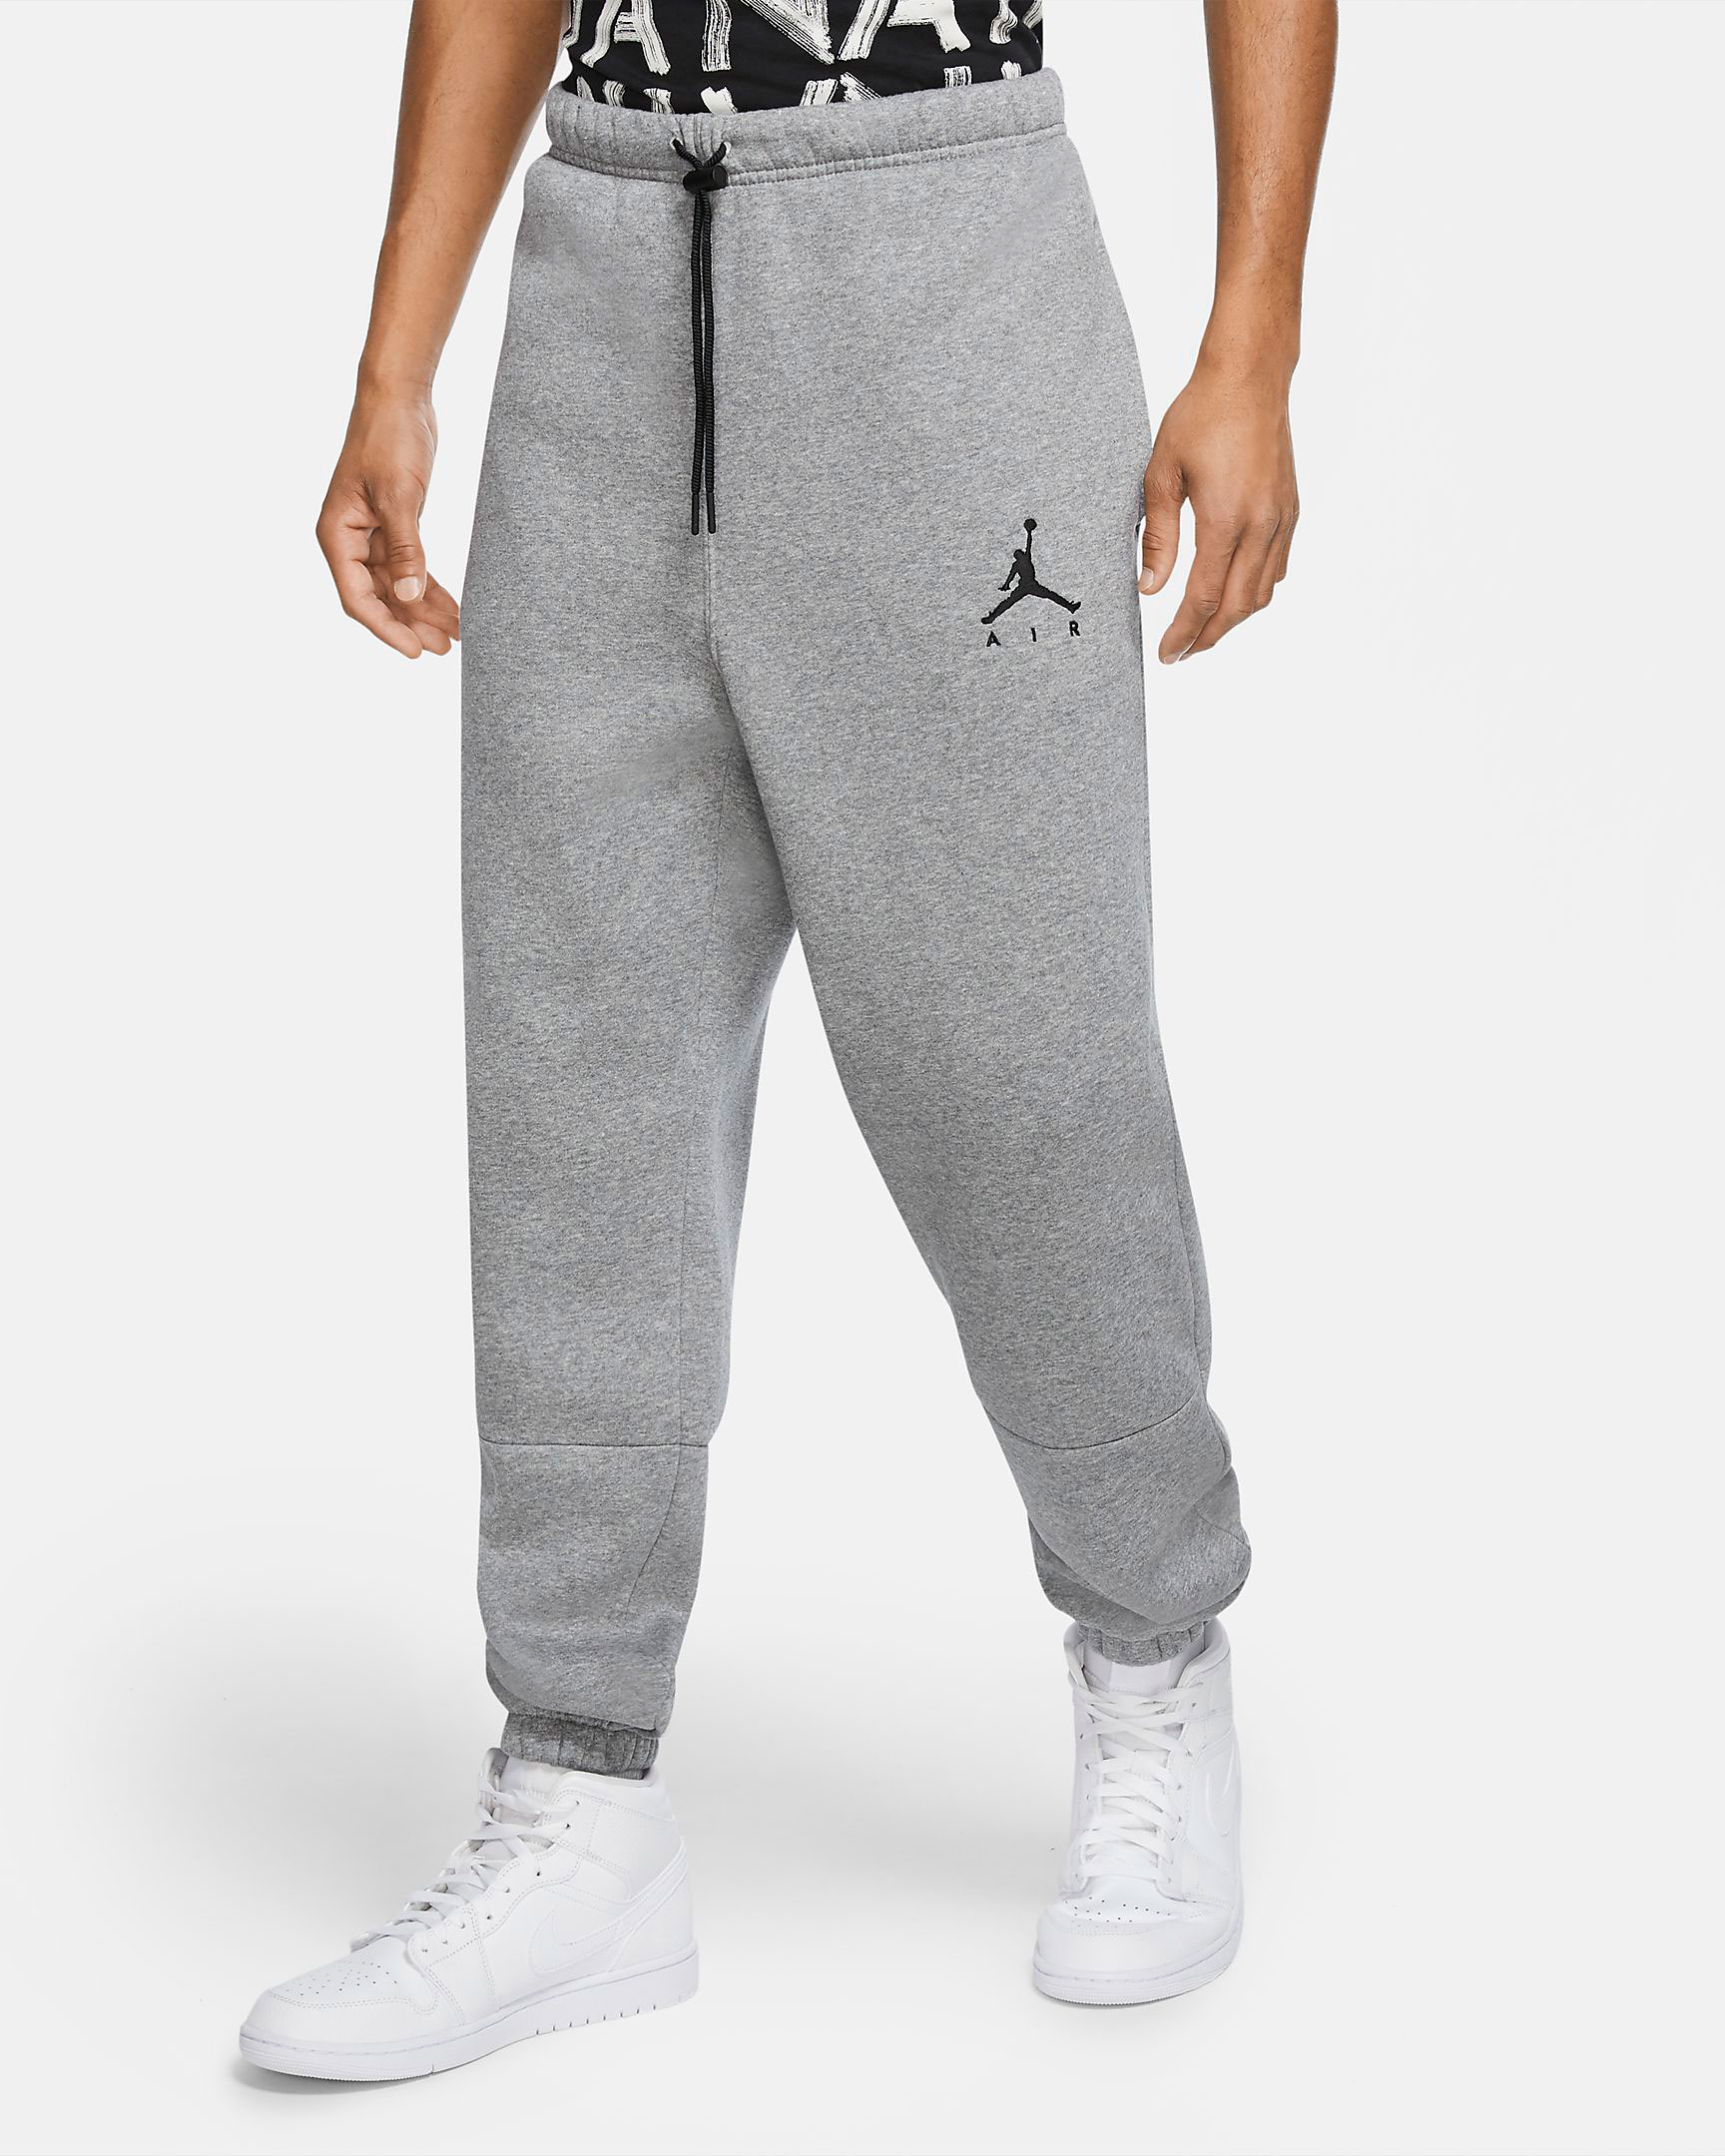 air-jordan-3-blue-cement-shirts-jogger-pants-match